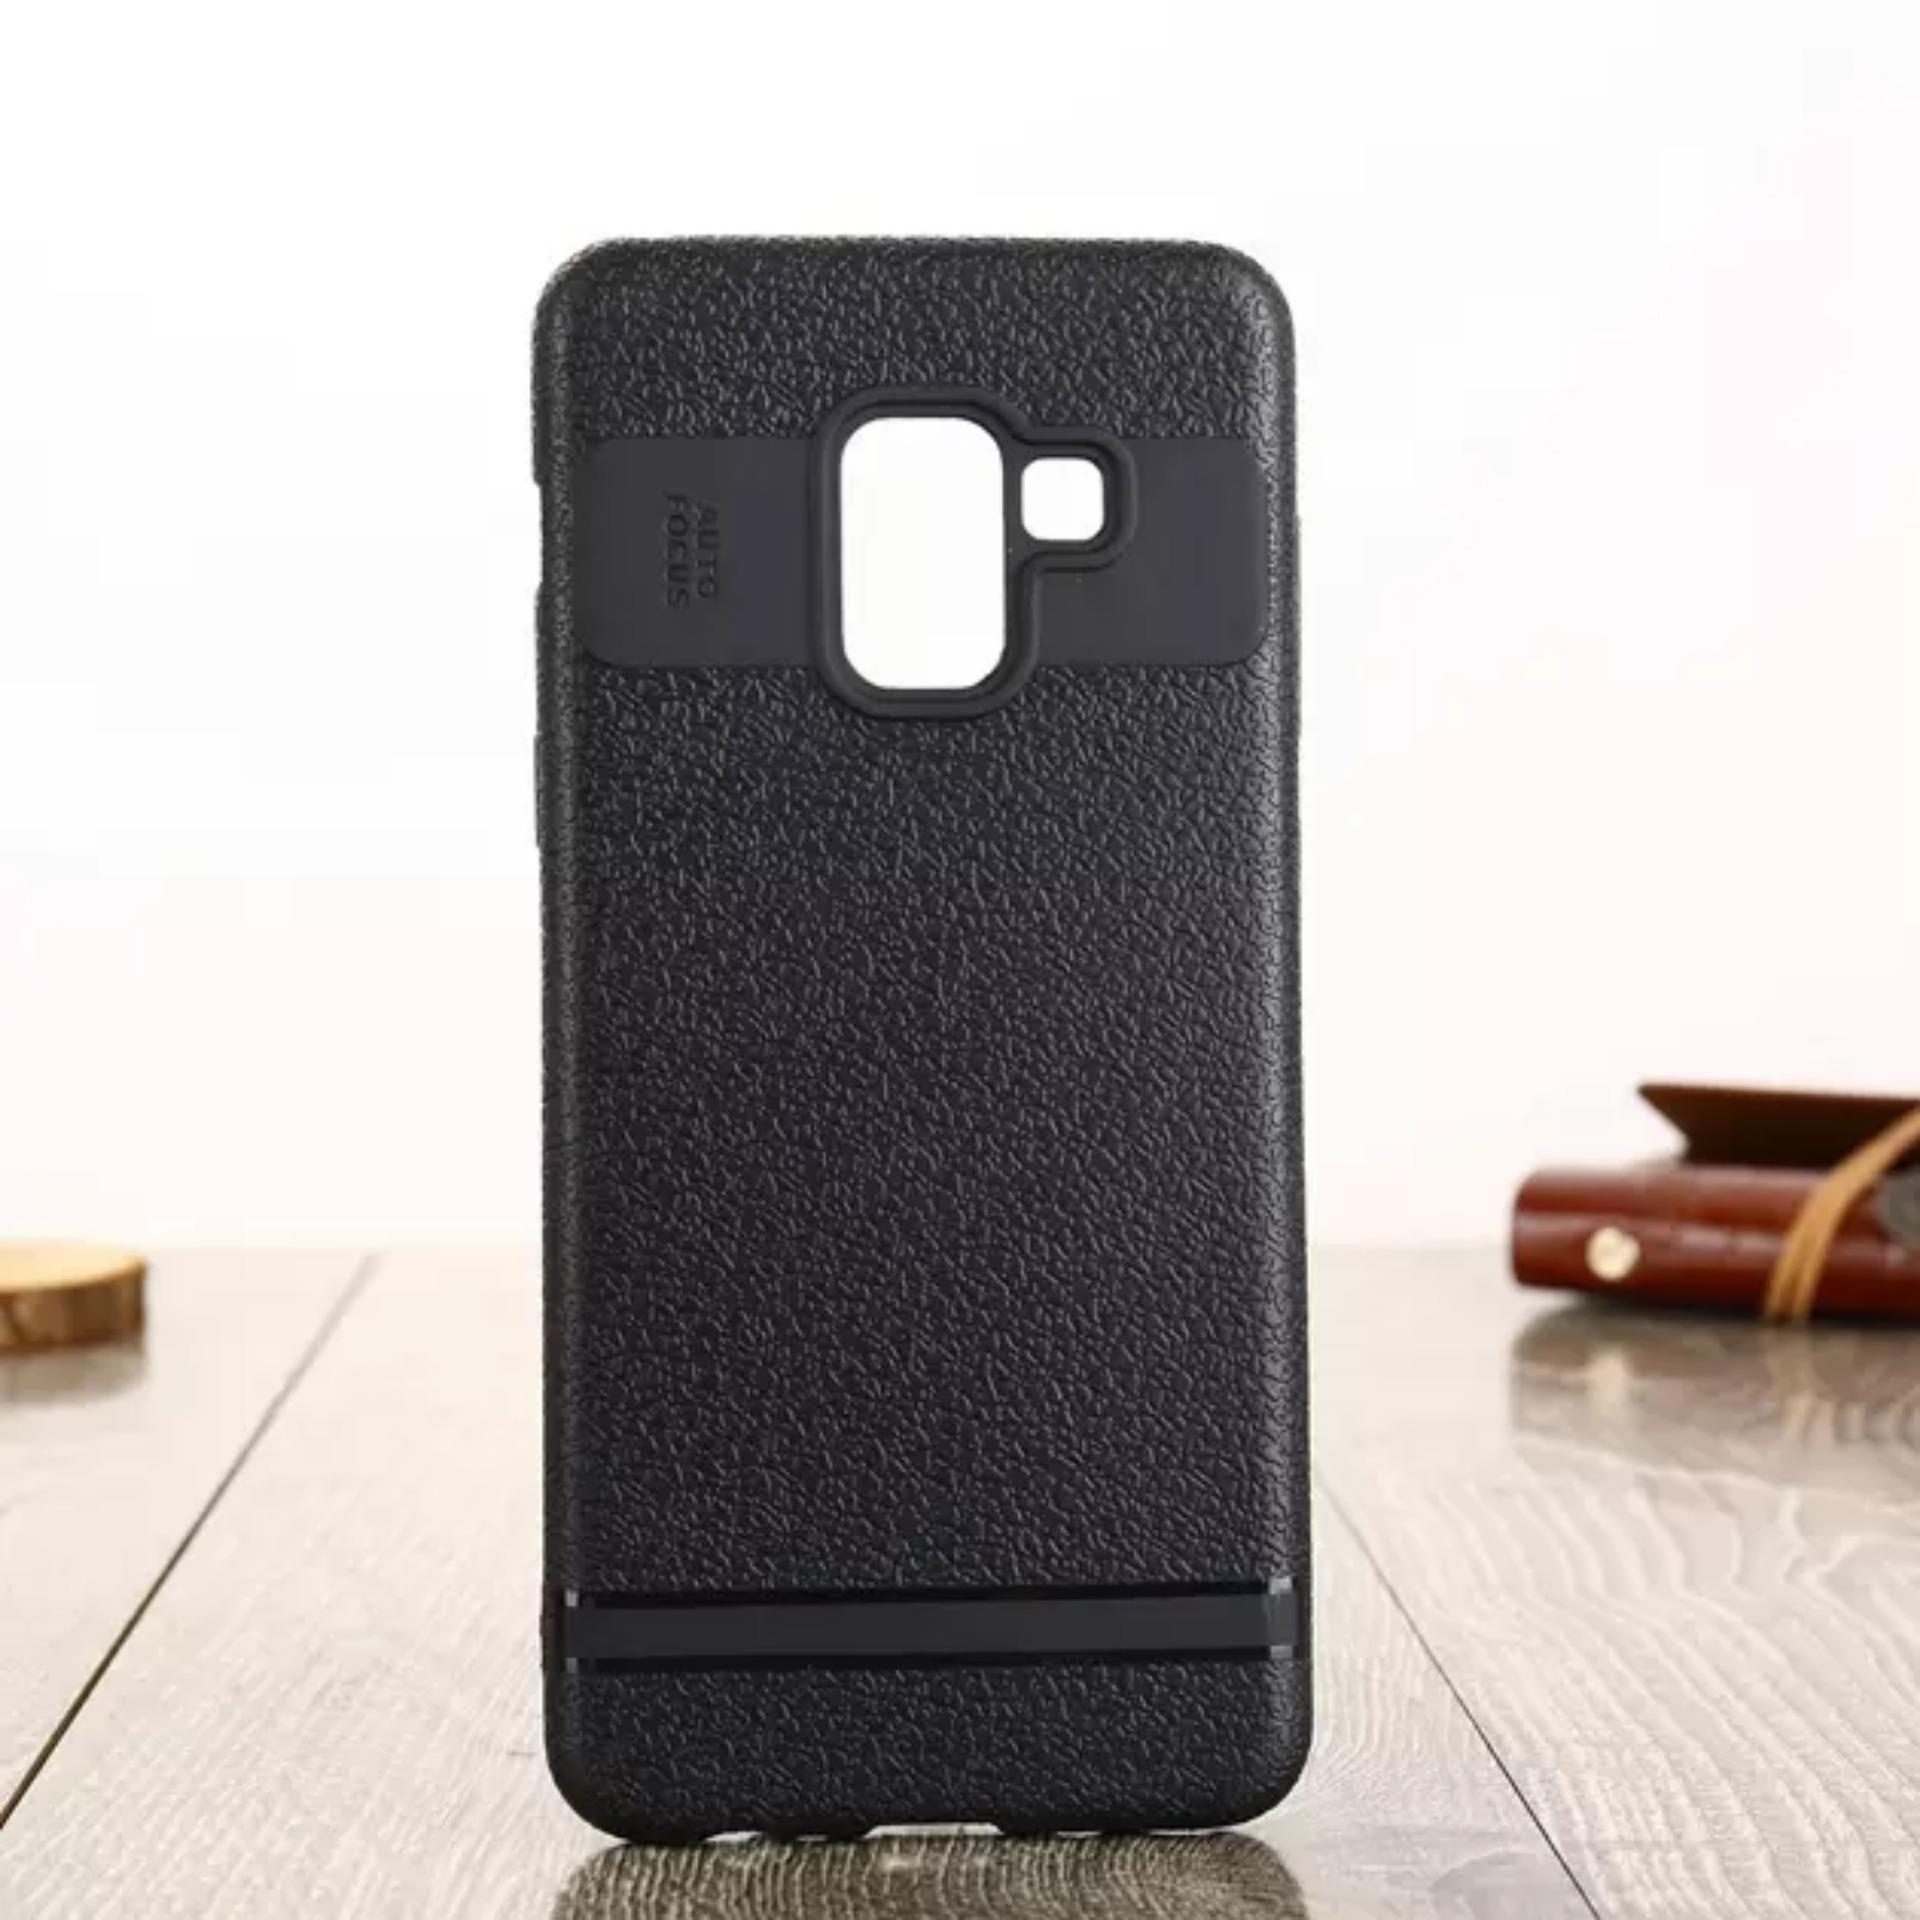 LOLLYPOP Auto Focus Samsung Galaxy J4 2018 Black Hitam TPU Flexible SOFTCASE Leather Premium Back Cover